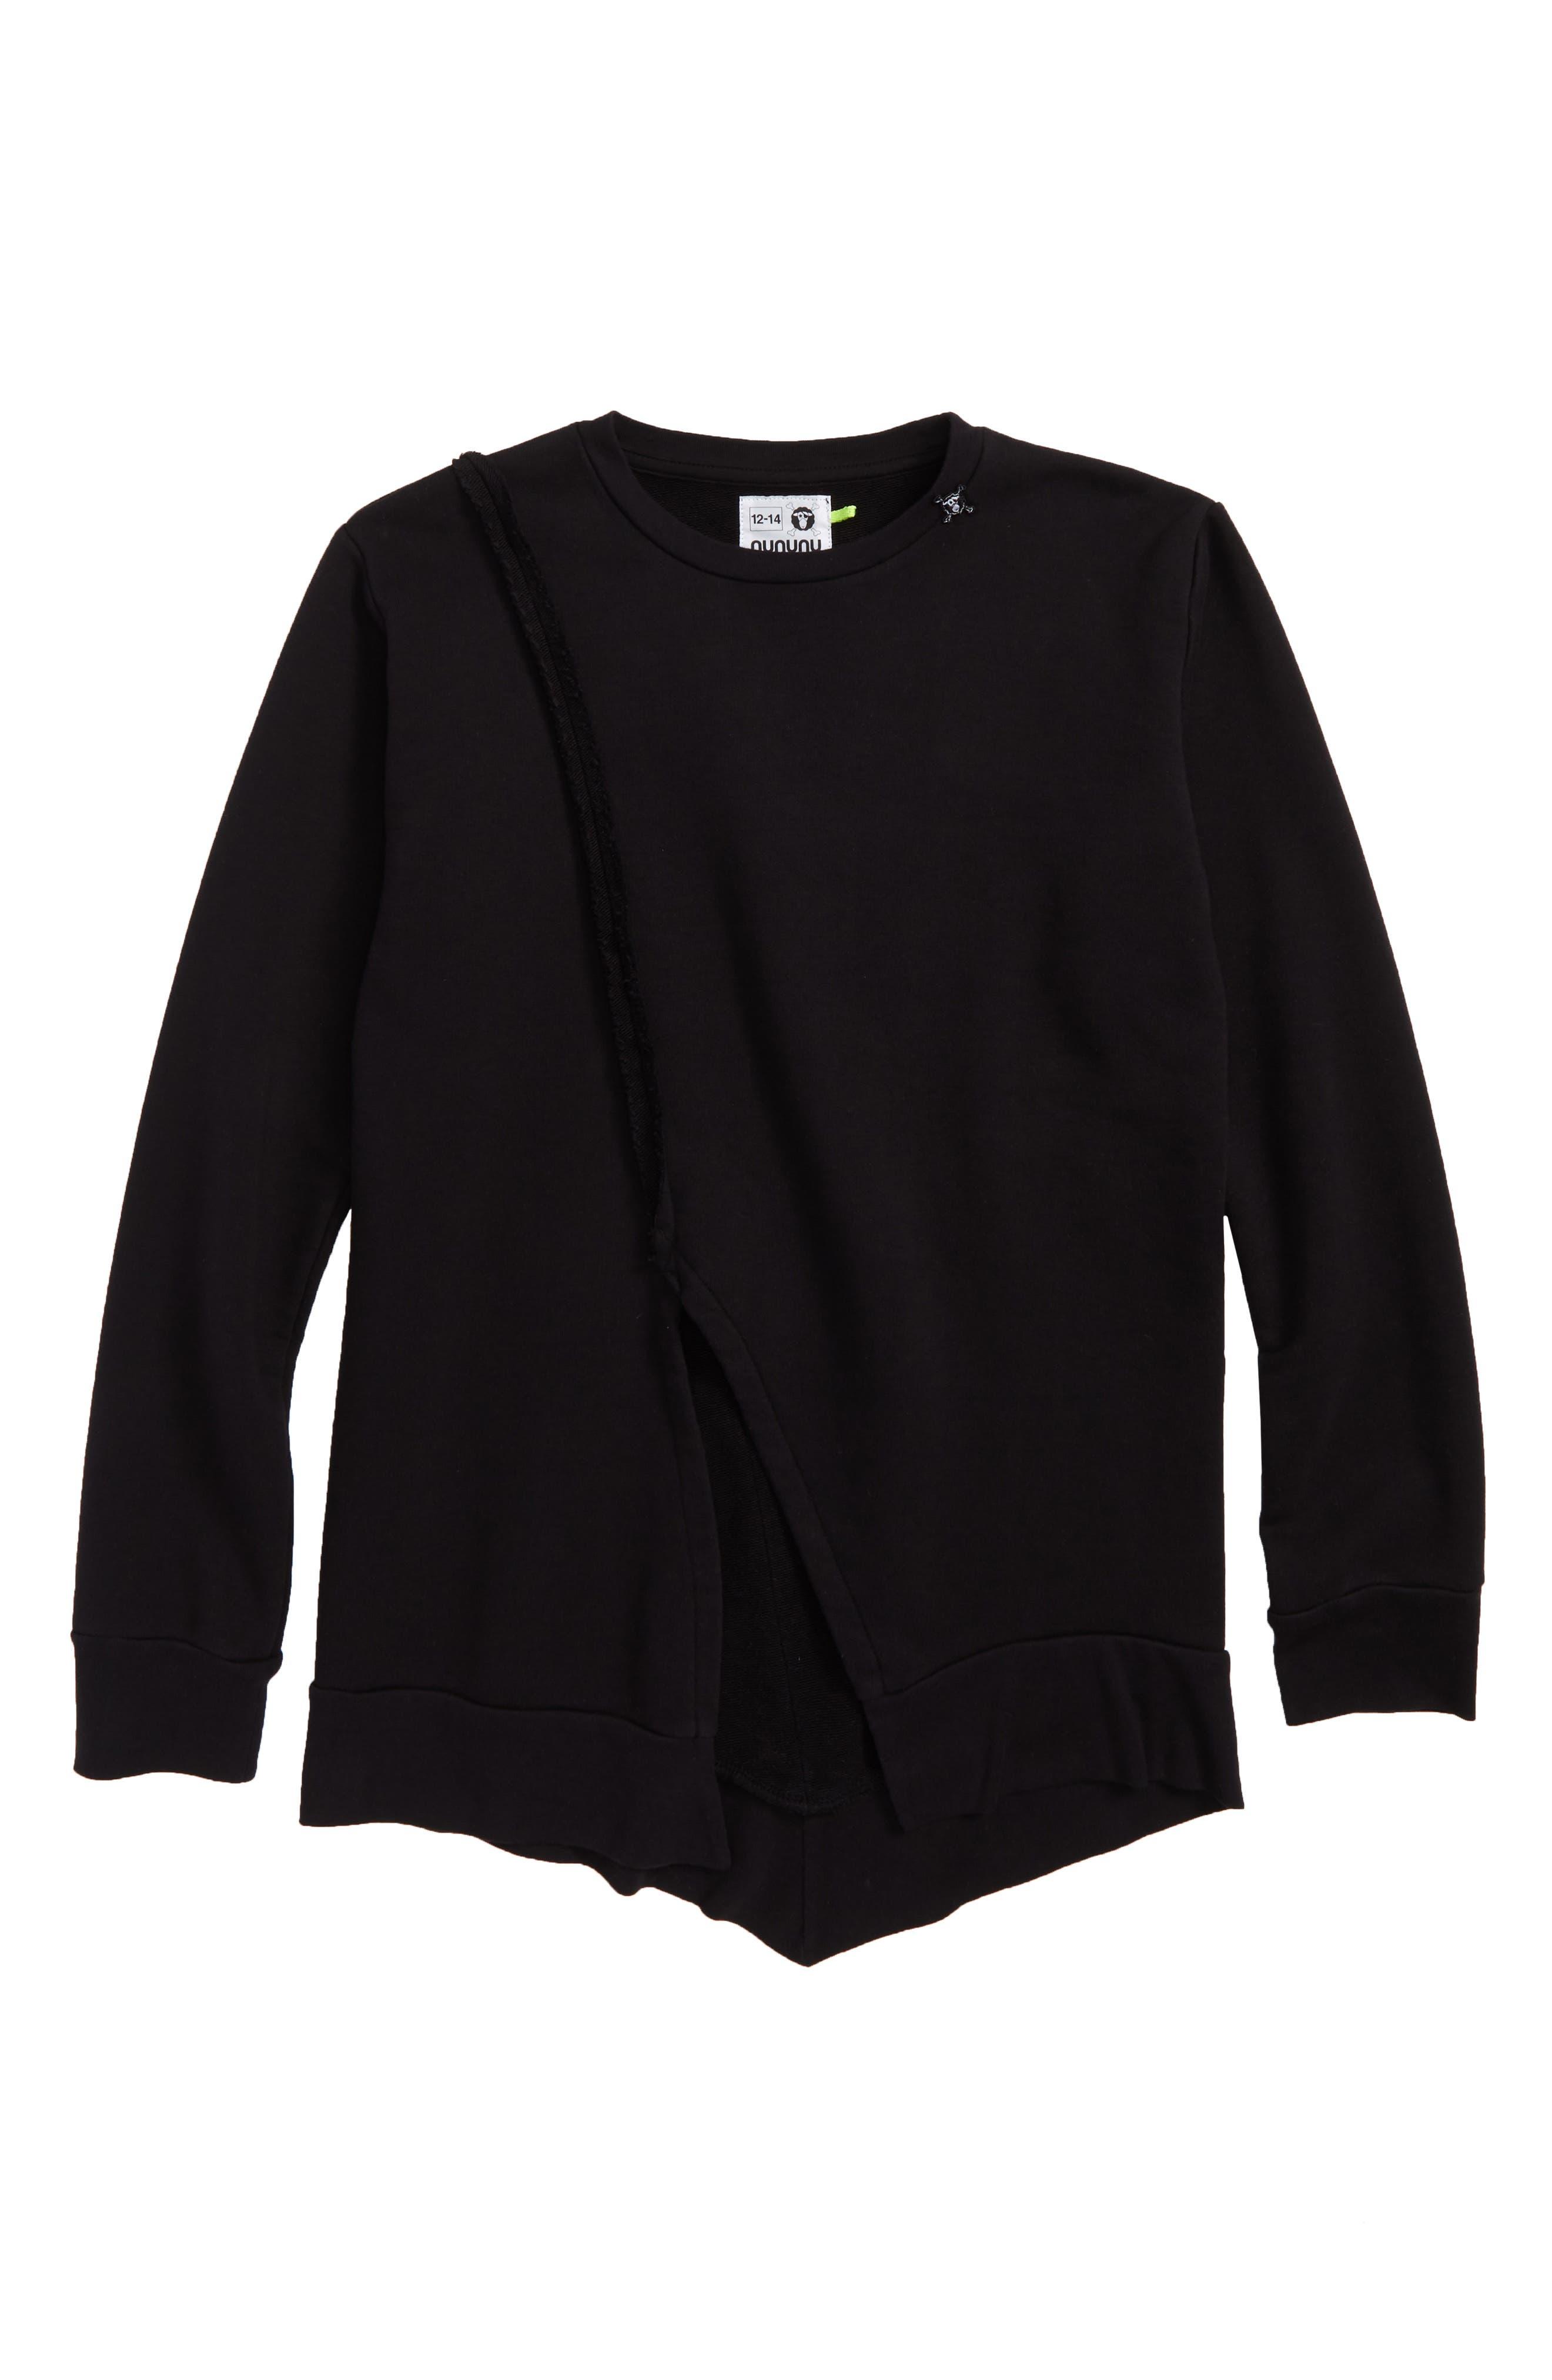 Penguin Sweatshirt,                         Main,                         color, BLACK